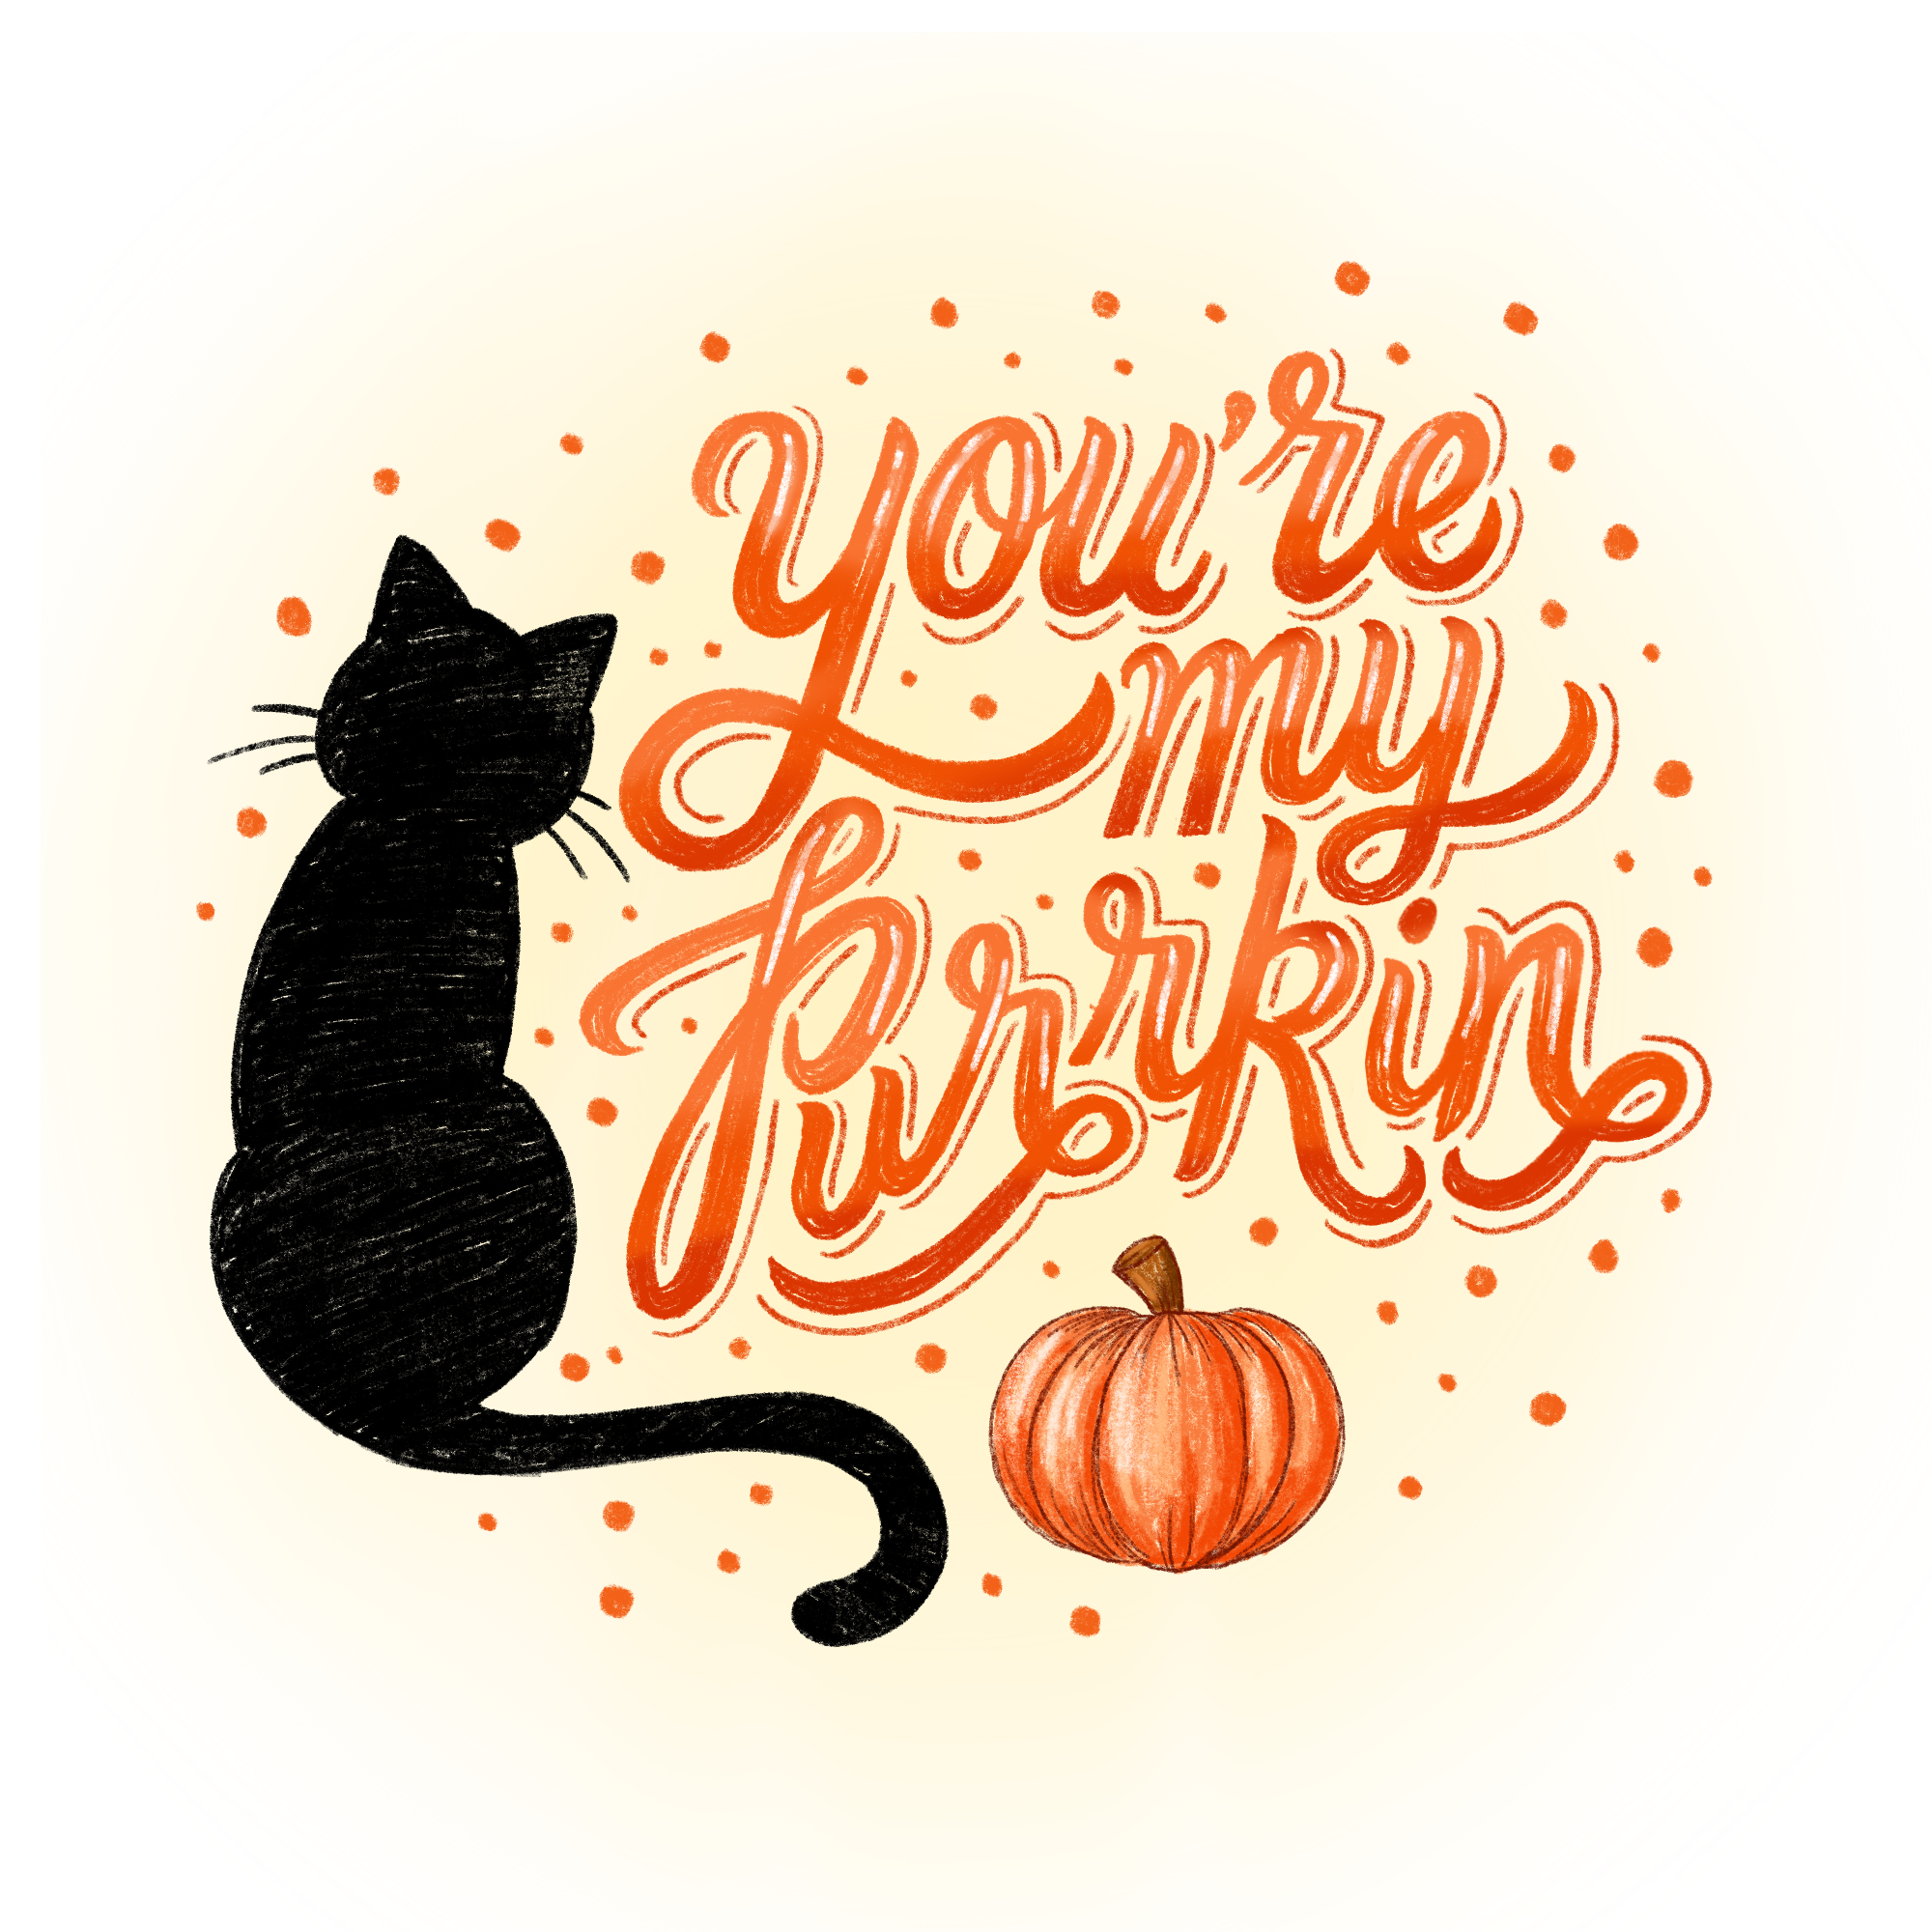 You re my purrkin